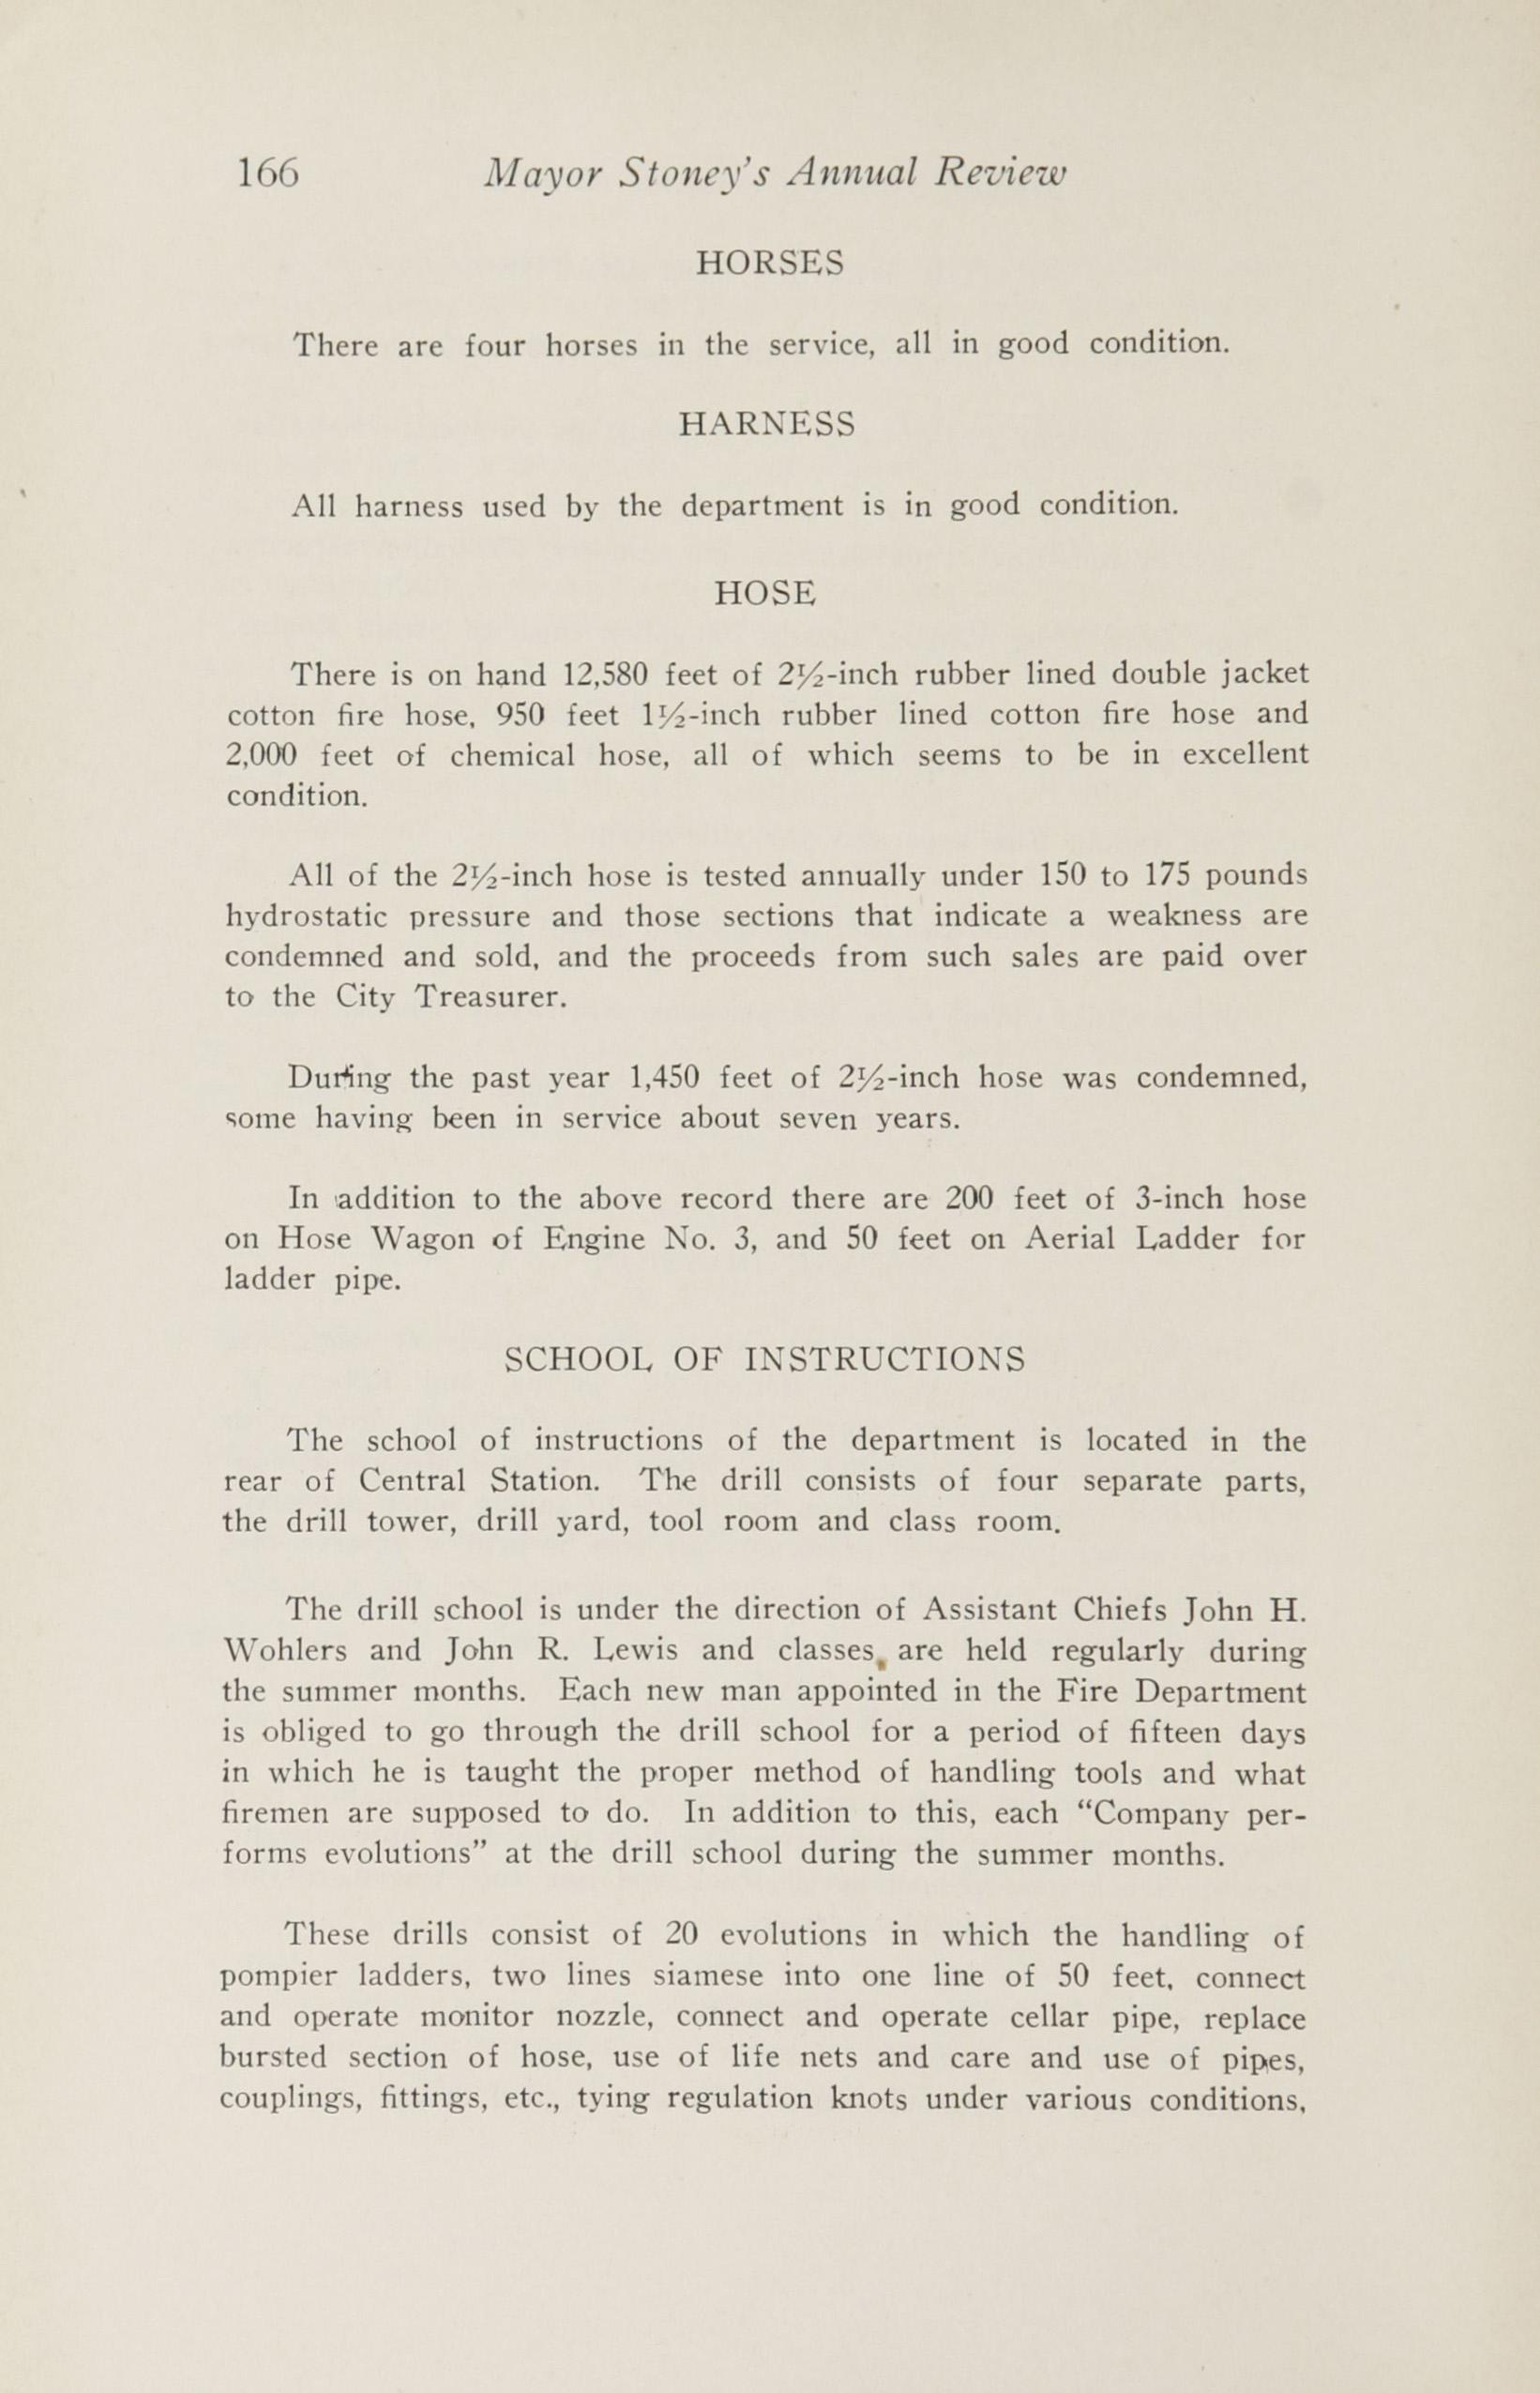 Charleston Yearbook, 1929, page 166